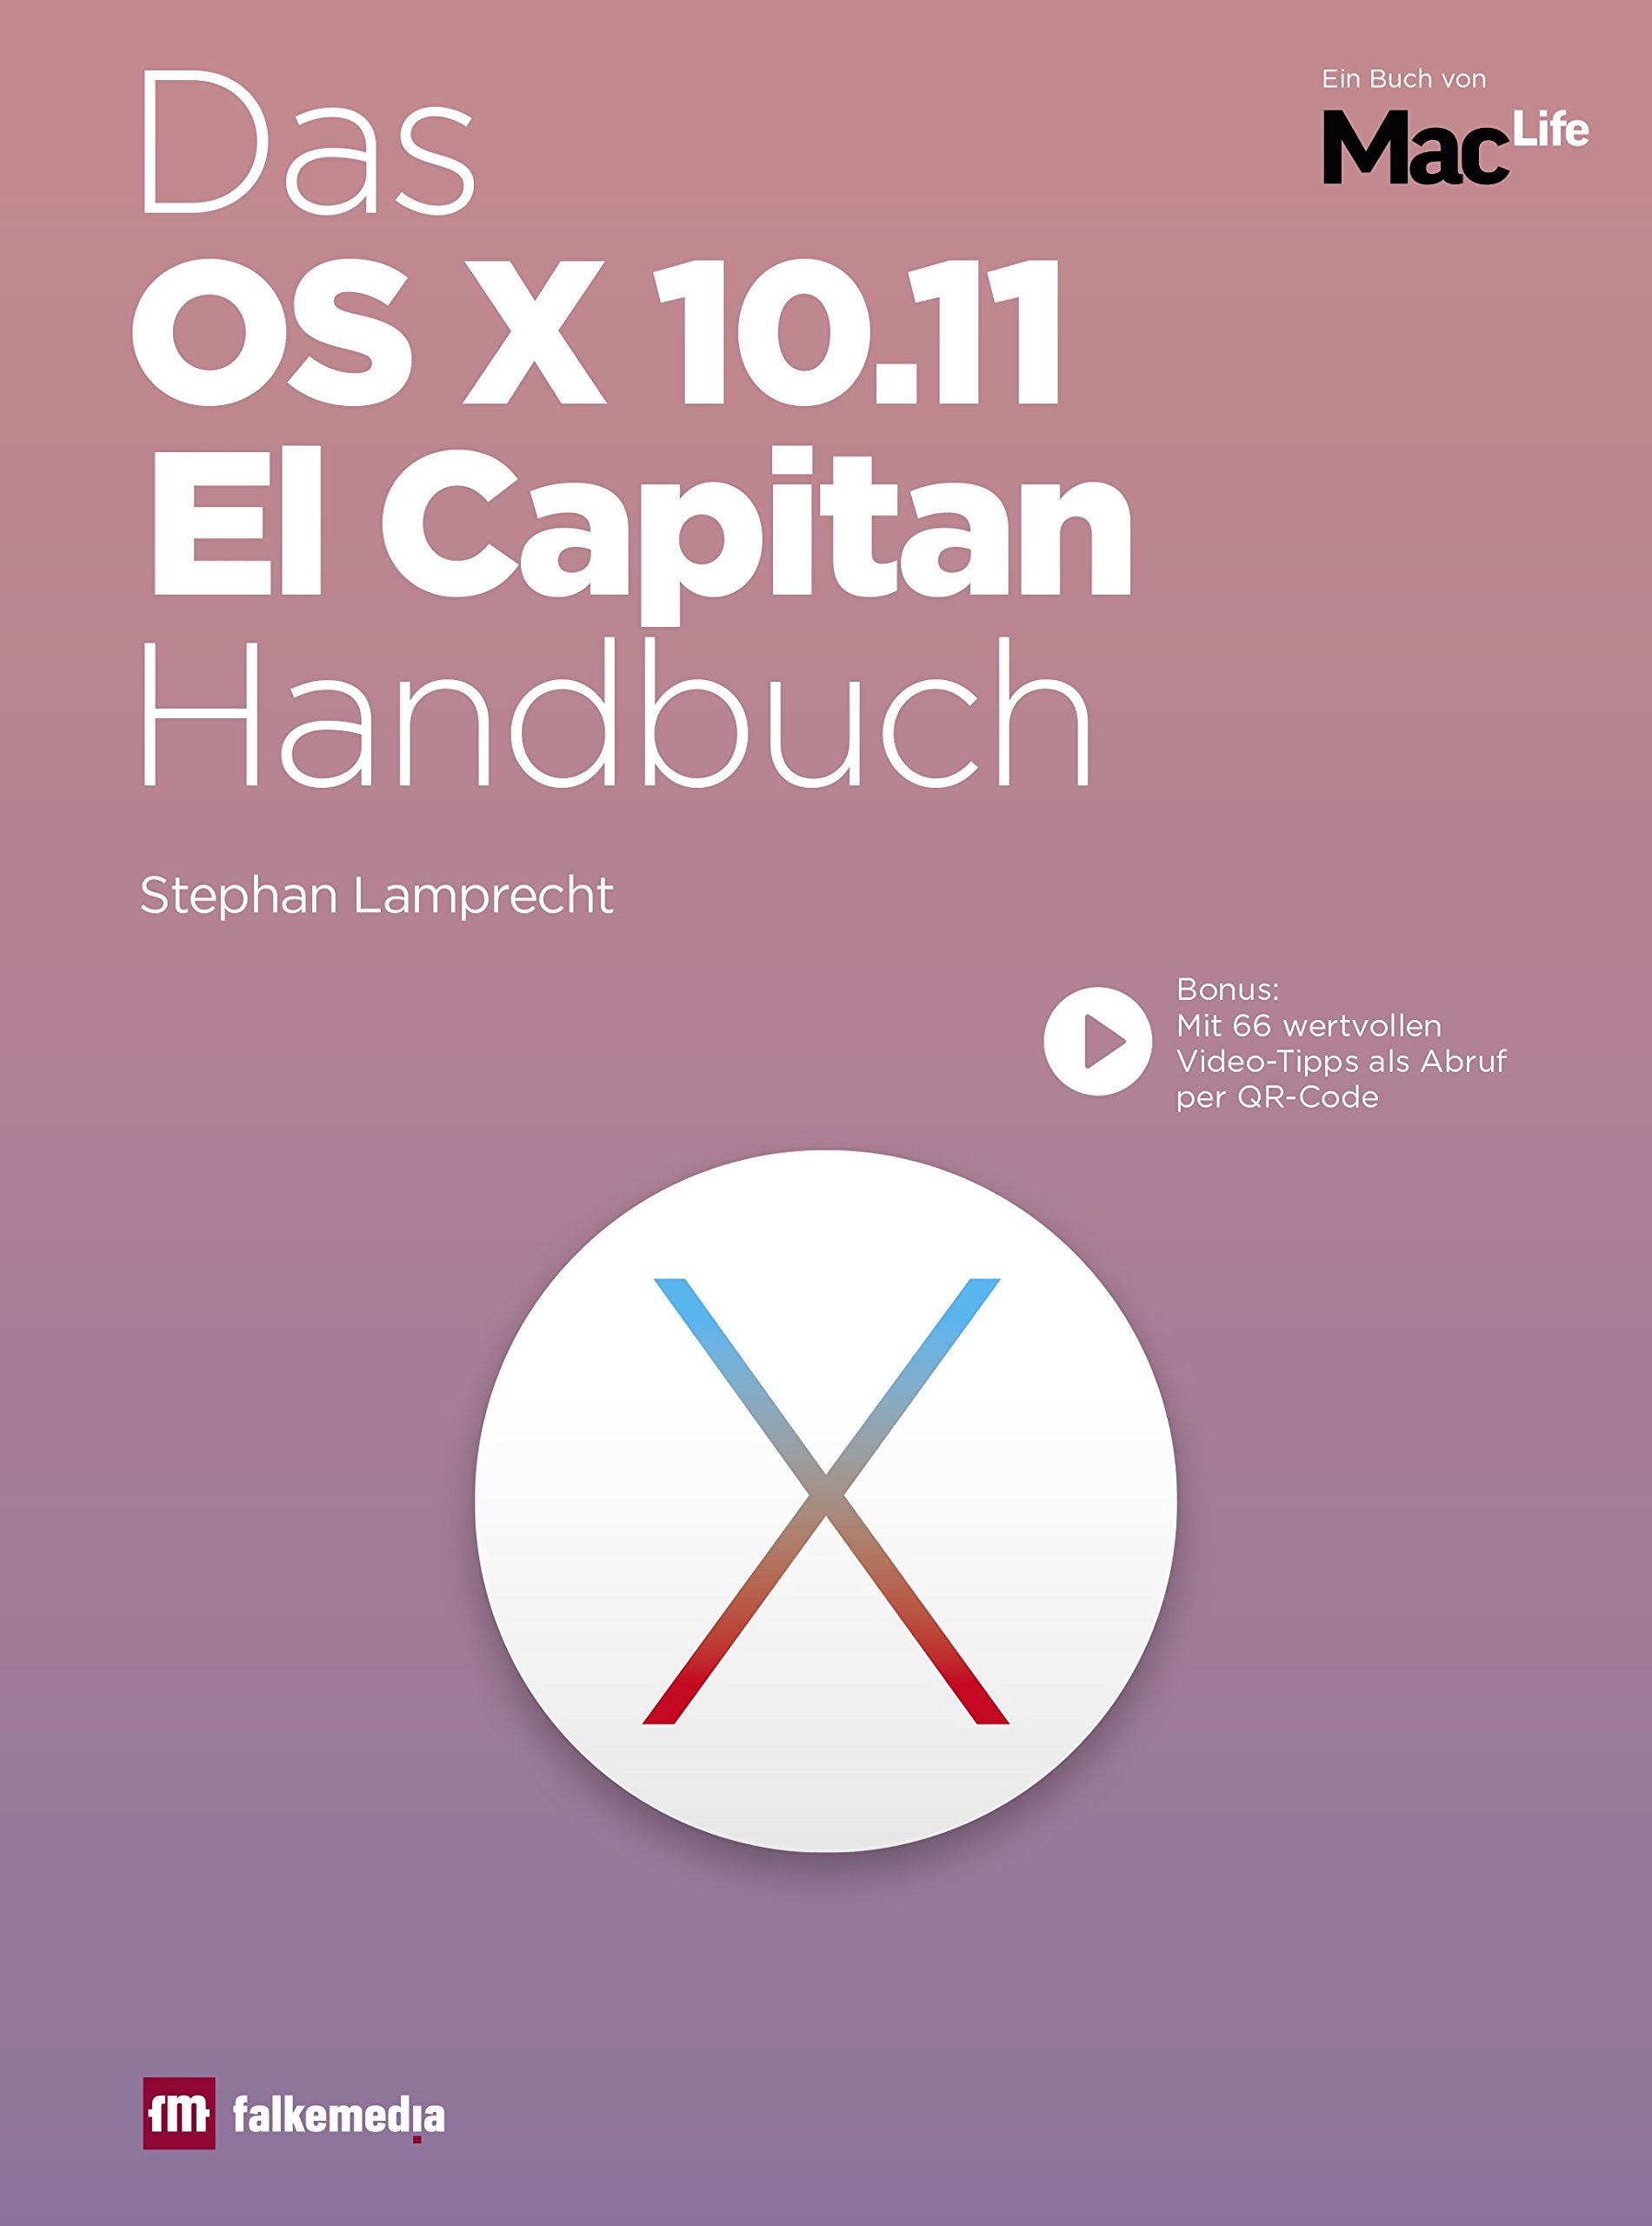 Das OS X 10.11 Apple El Capitan Handbuch